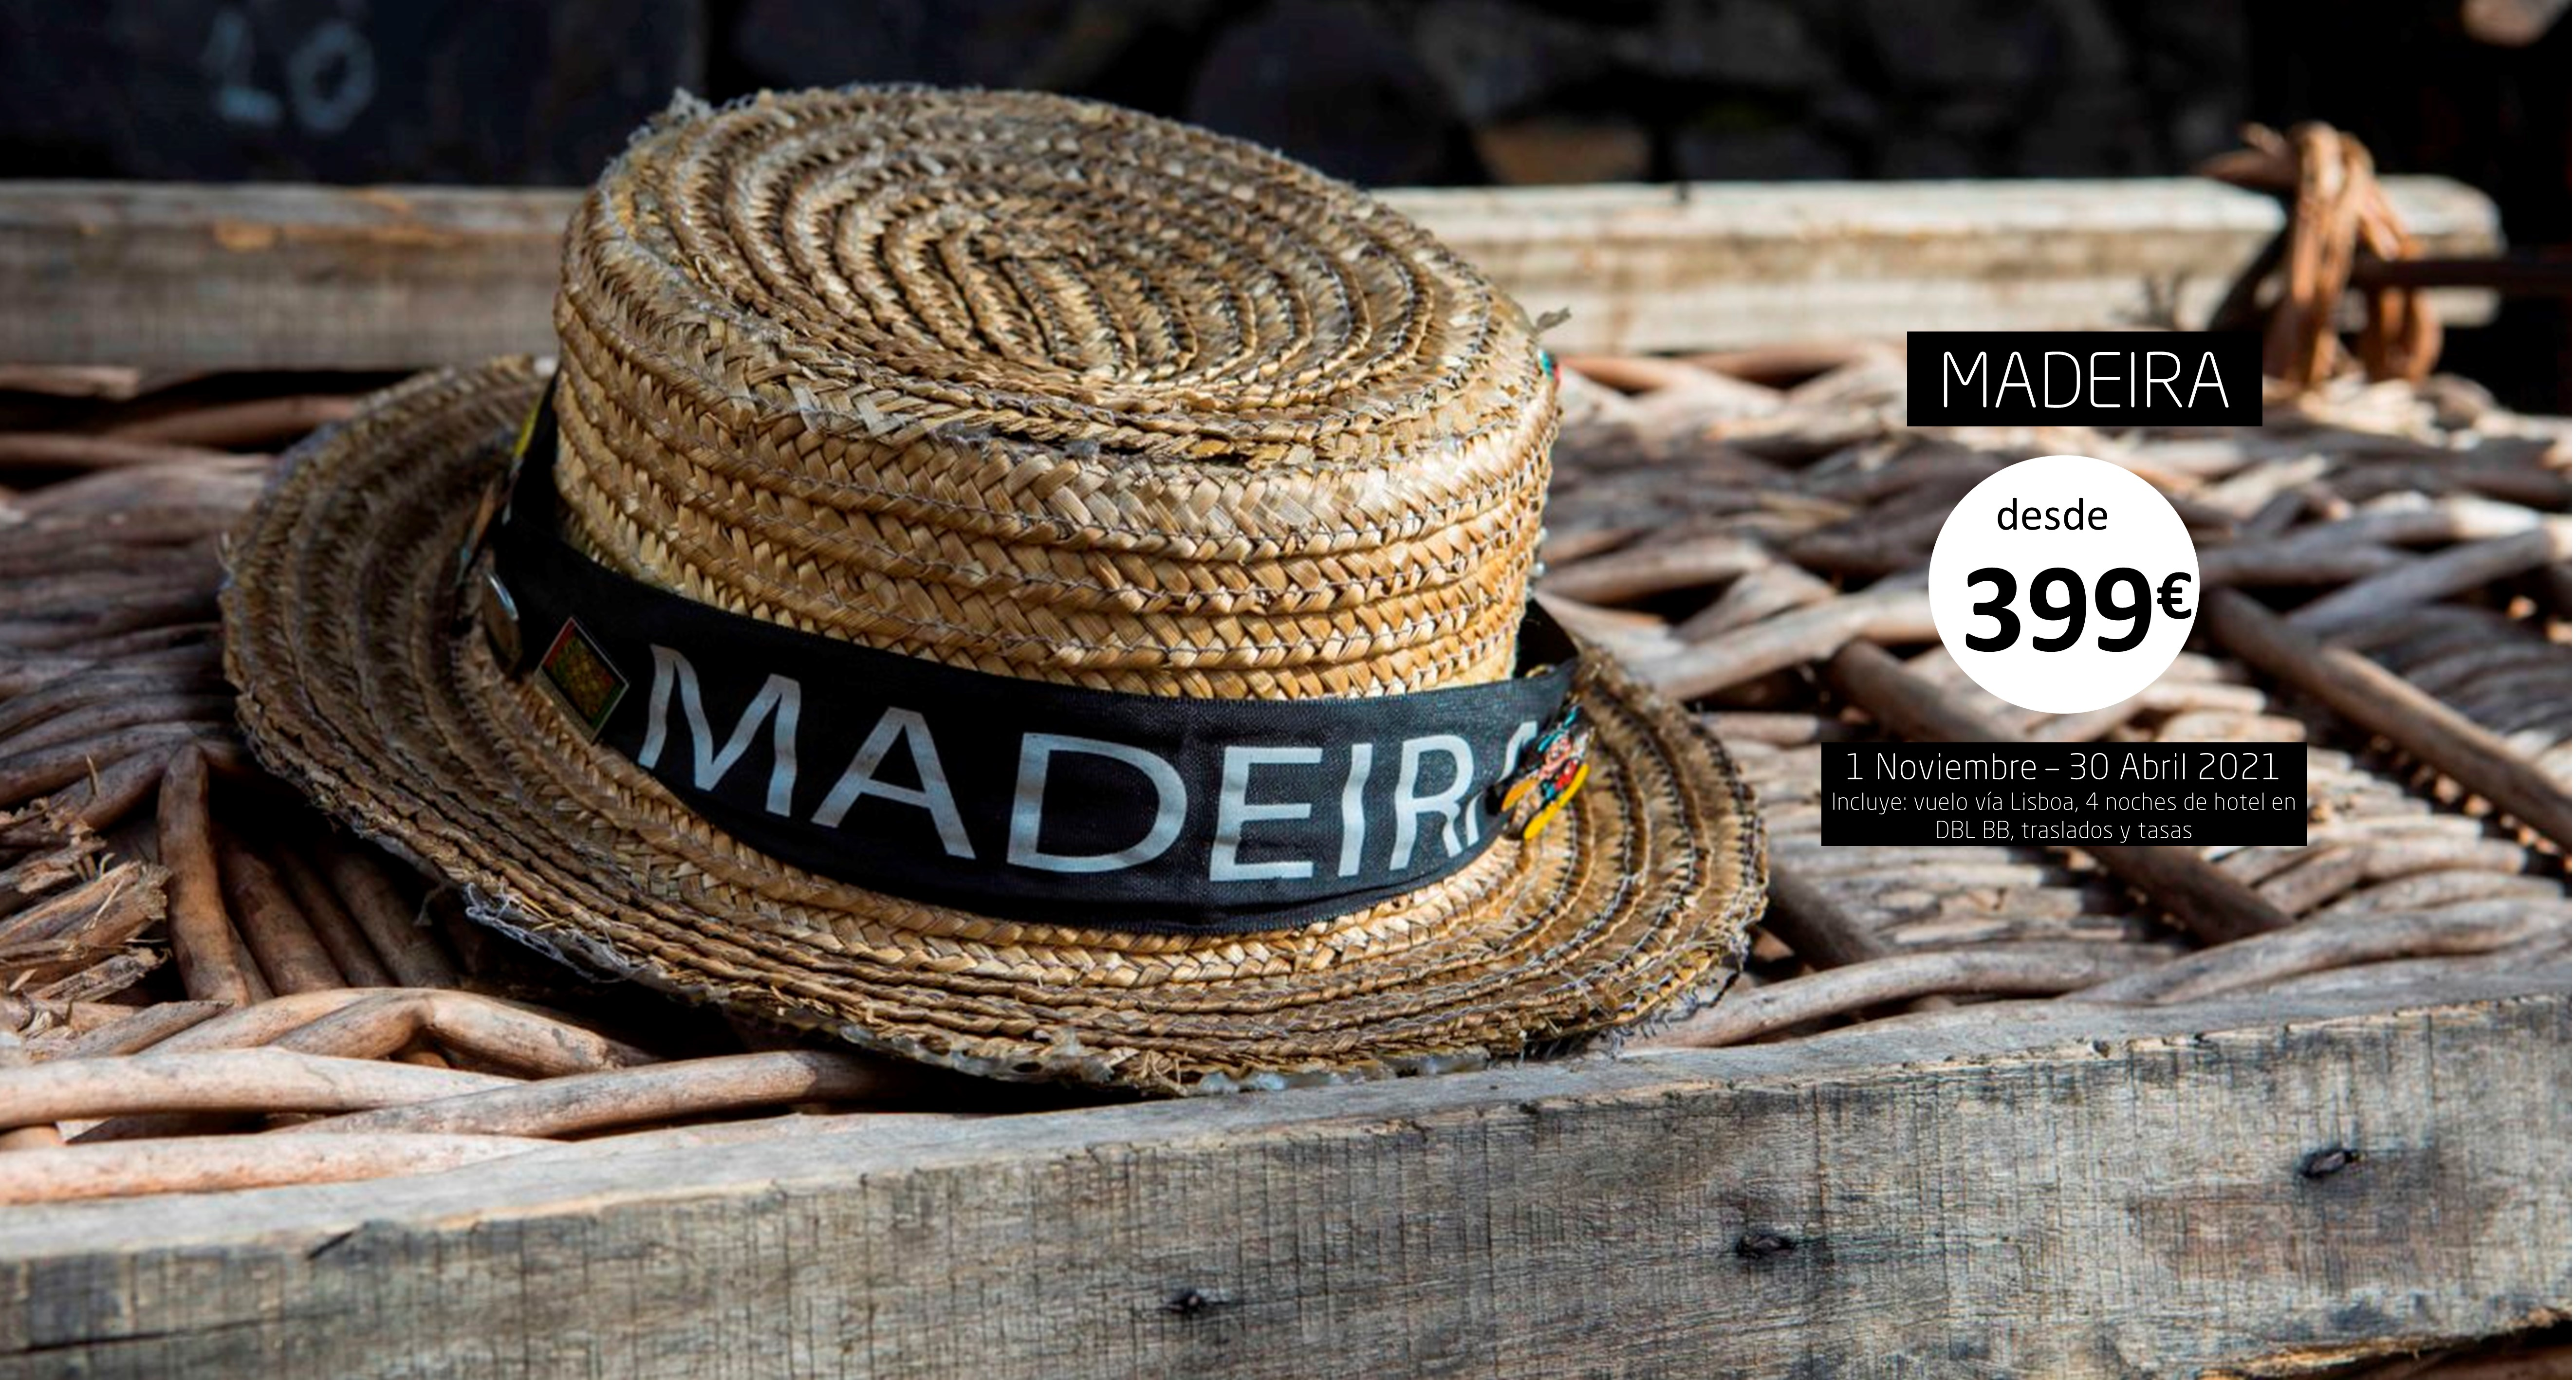 Madeira linea regular